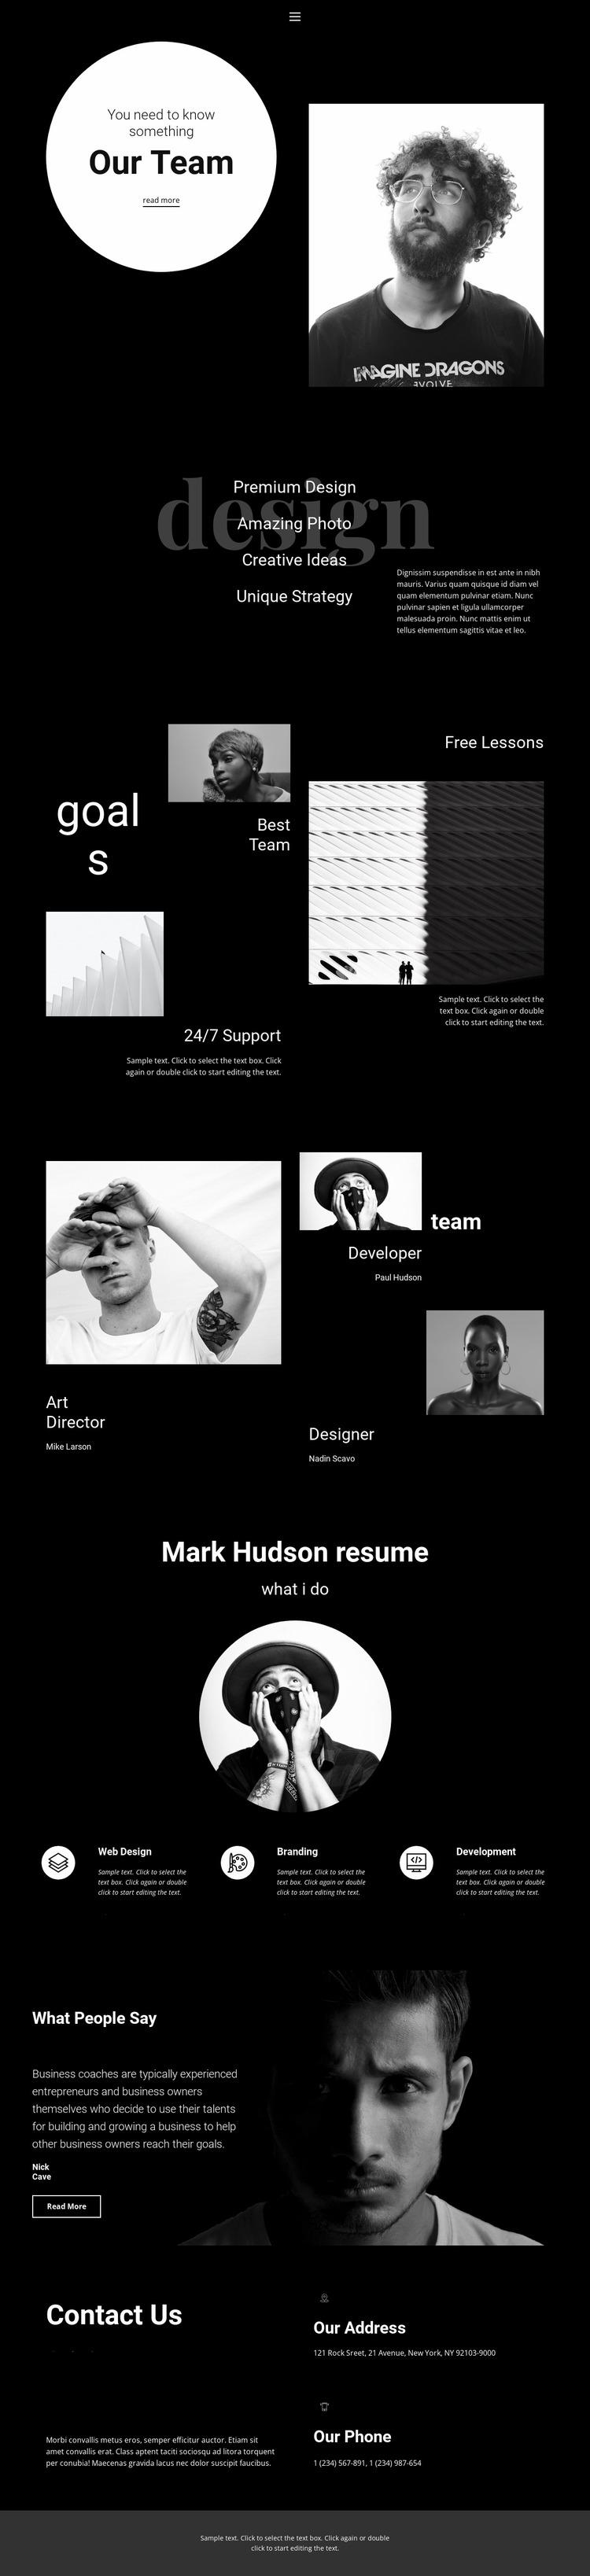 Design and development team Website Mockup